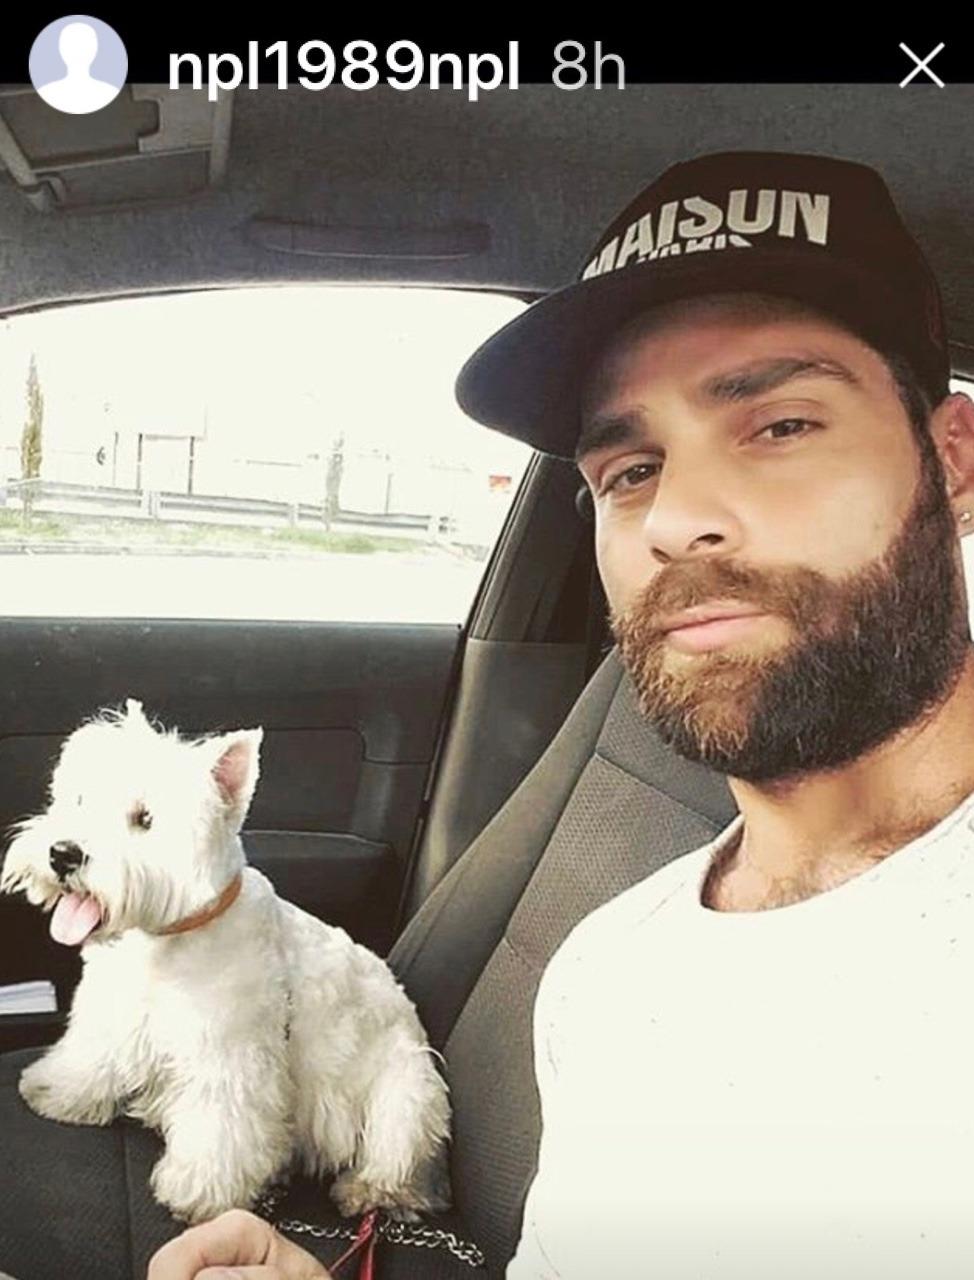 photo : npl1989npl instagram beardburnme http://www.neofic.com